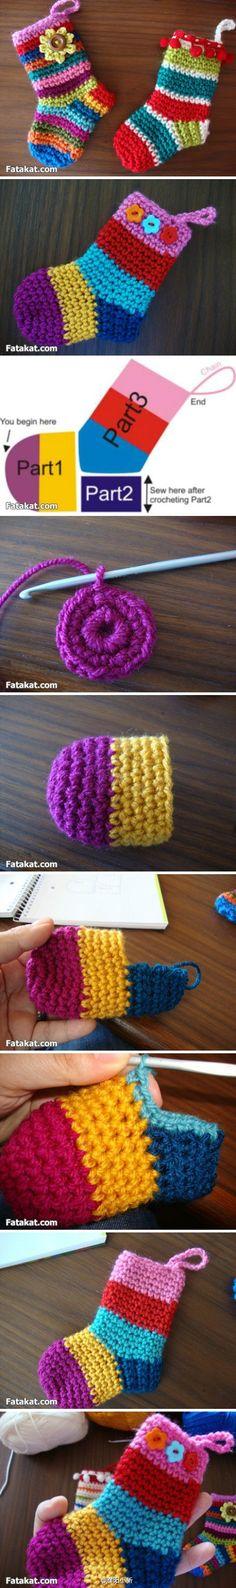 how to make socks.